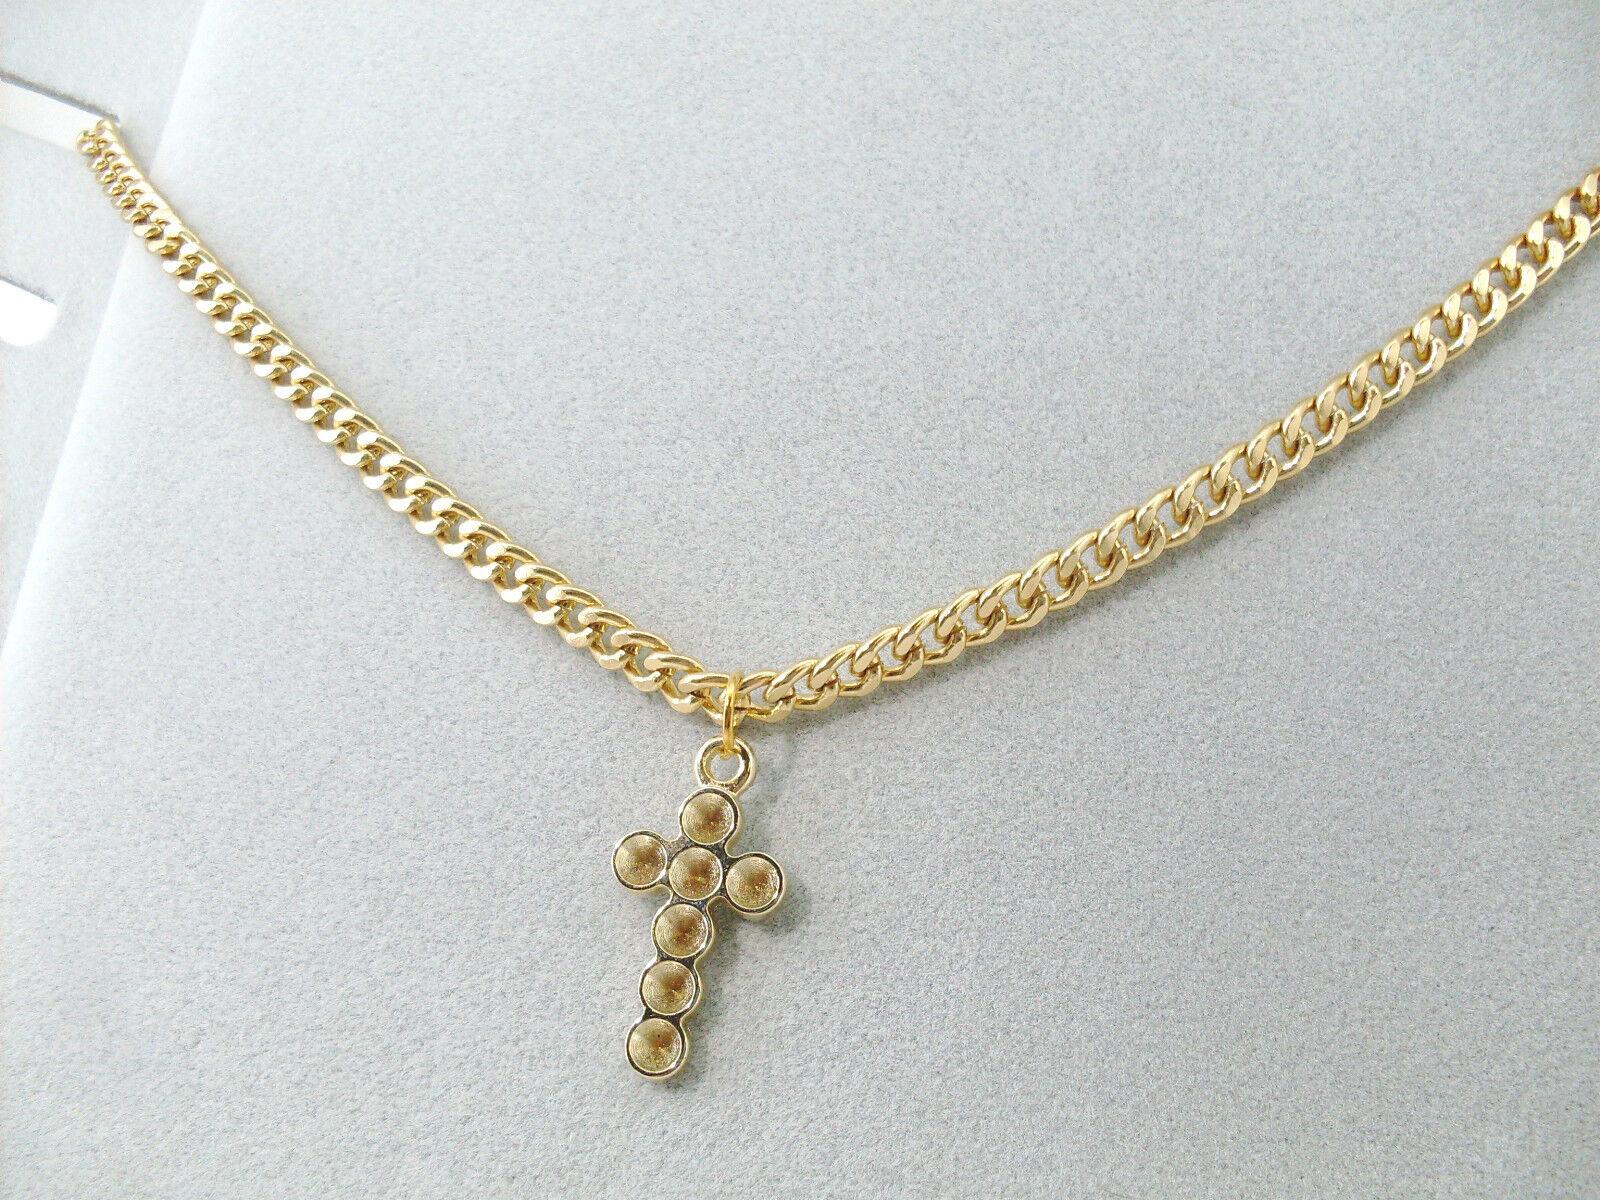 Collana con Croce Oro Unisex Uomo Donna da 45 cm a 60 cm Girocollo Collanina